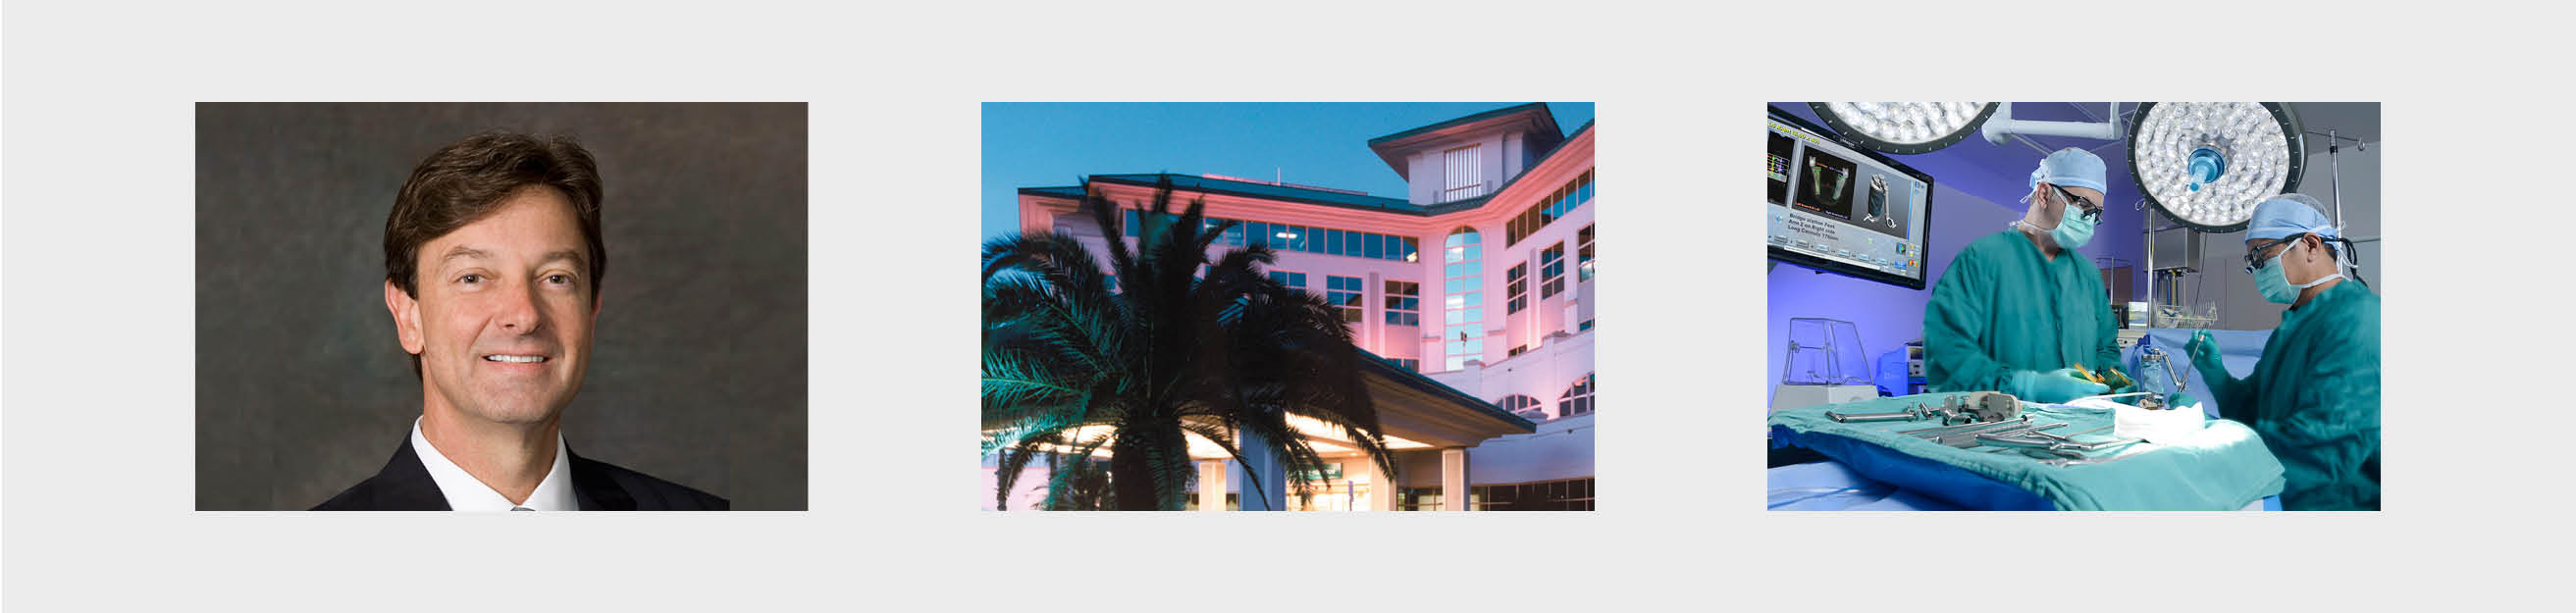 Doctors Hospital images